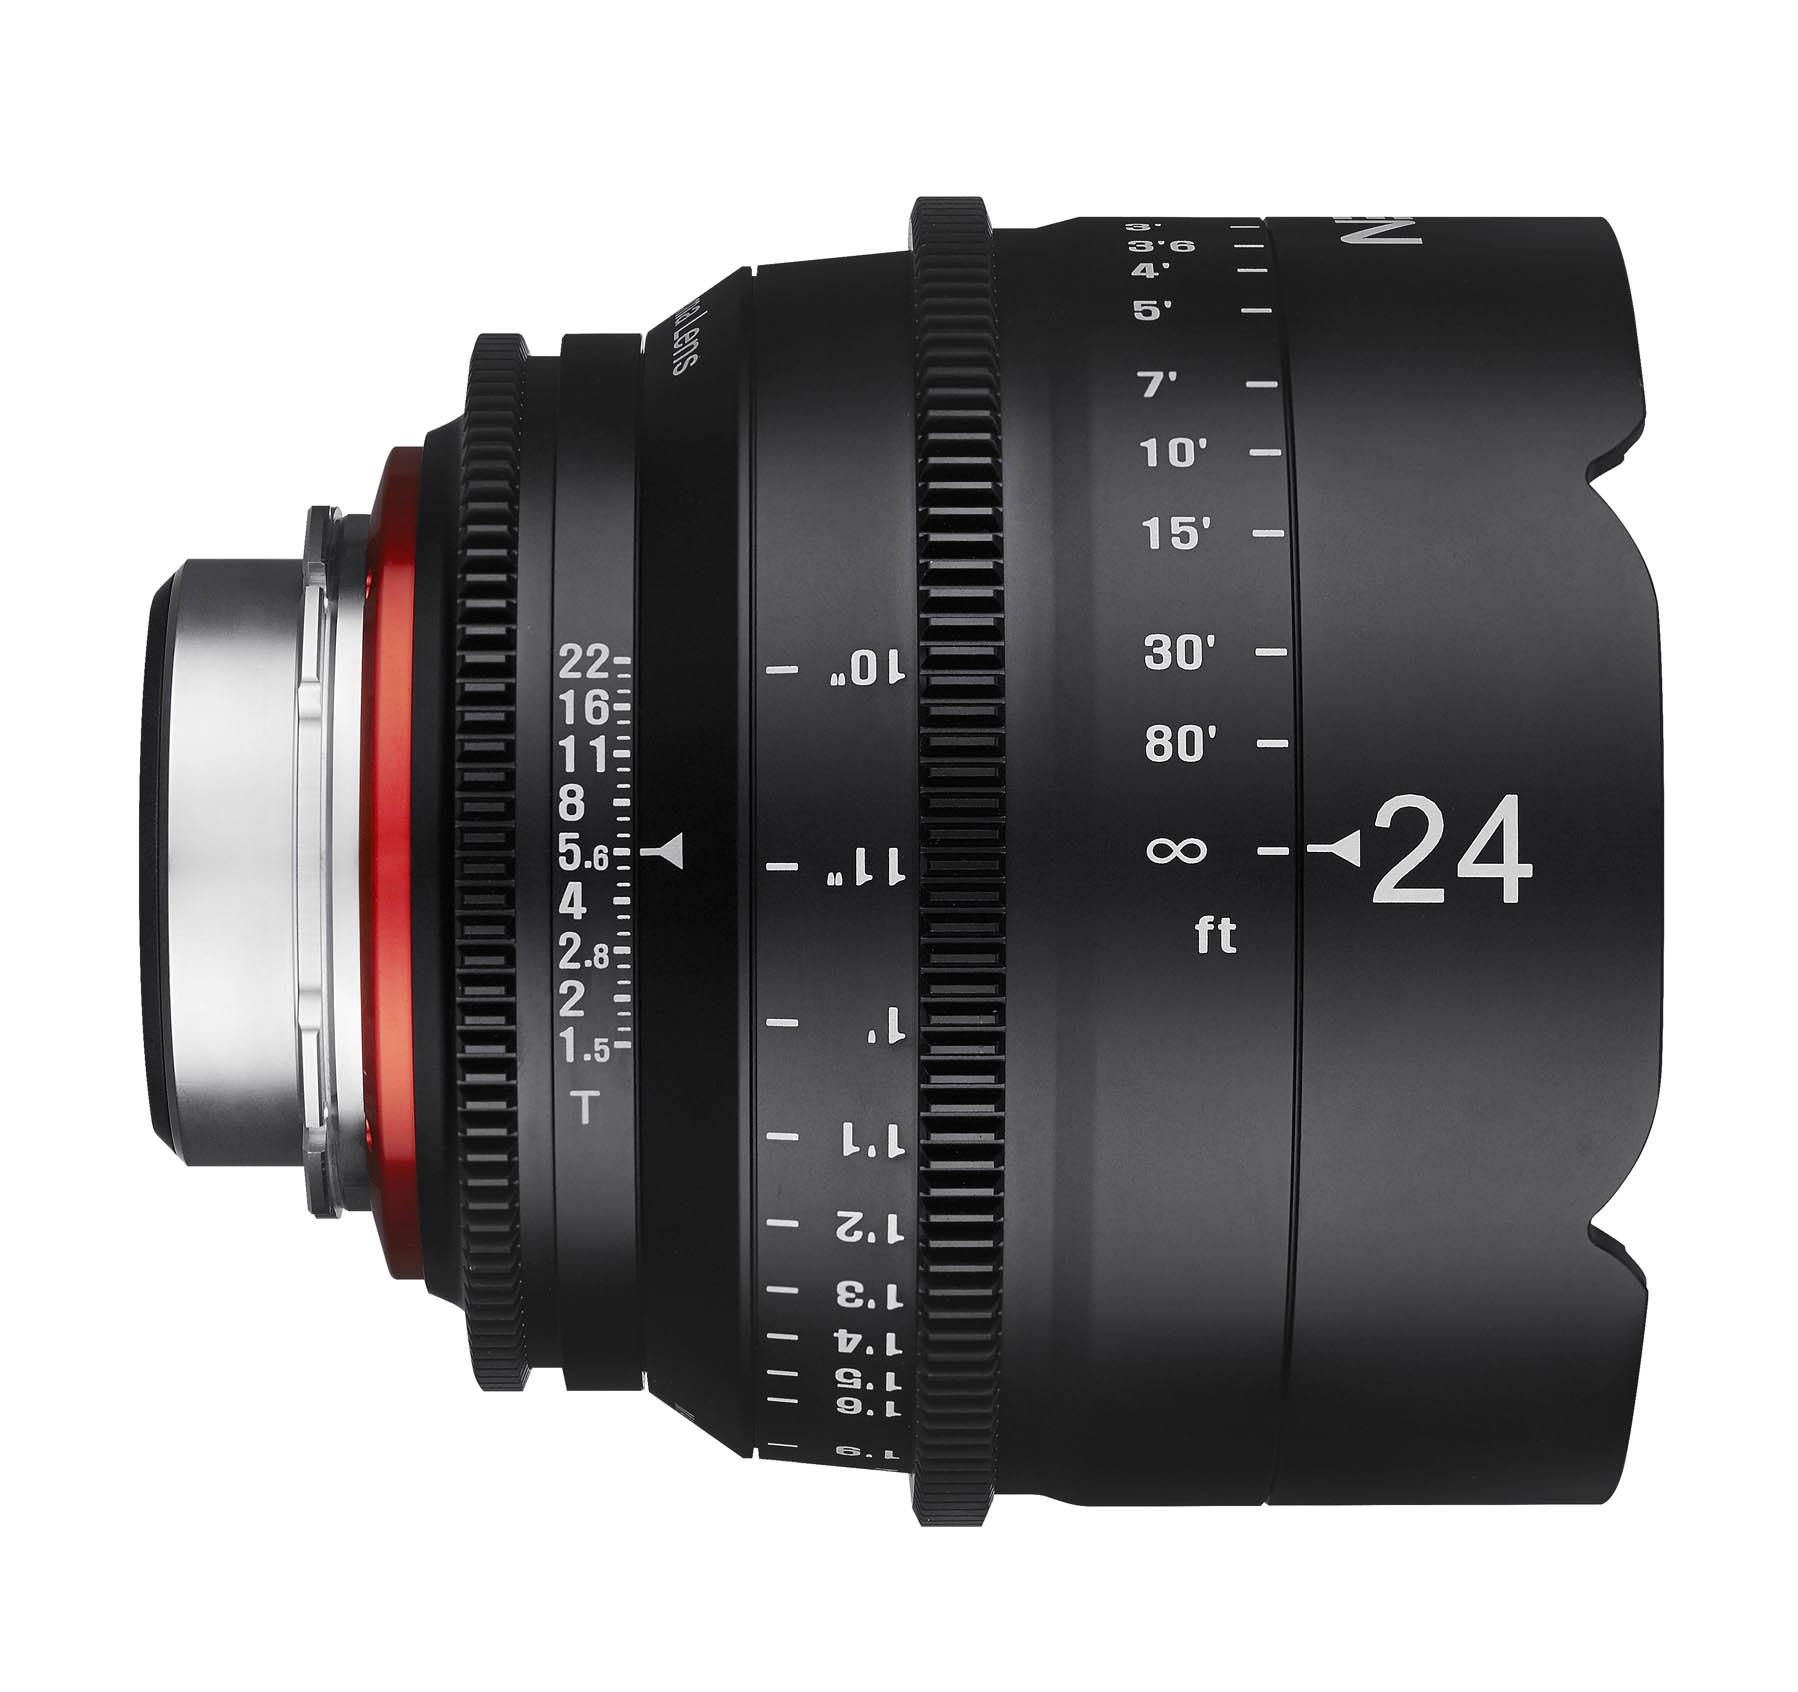 24mm T1.5